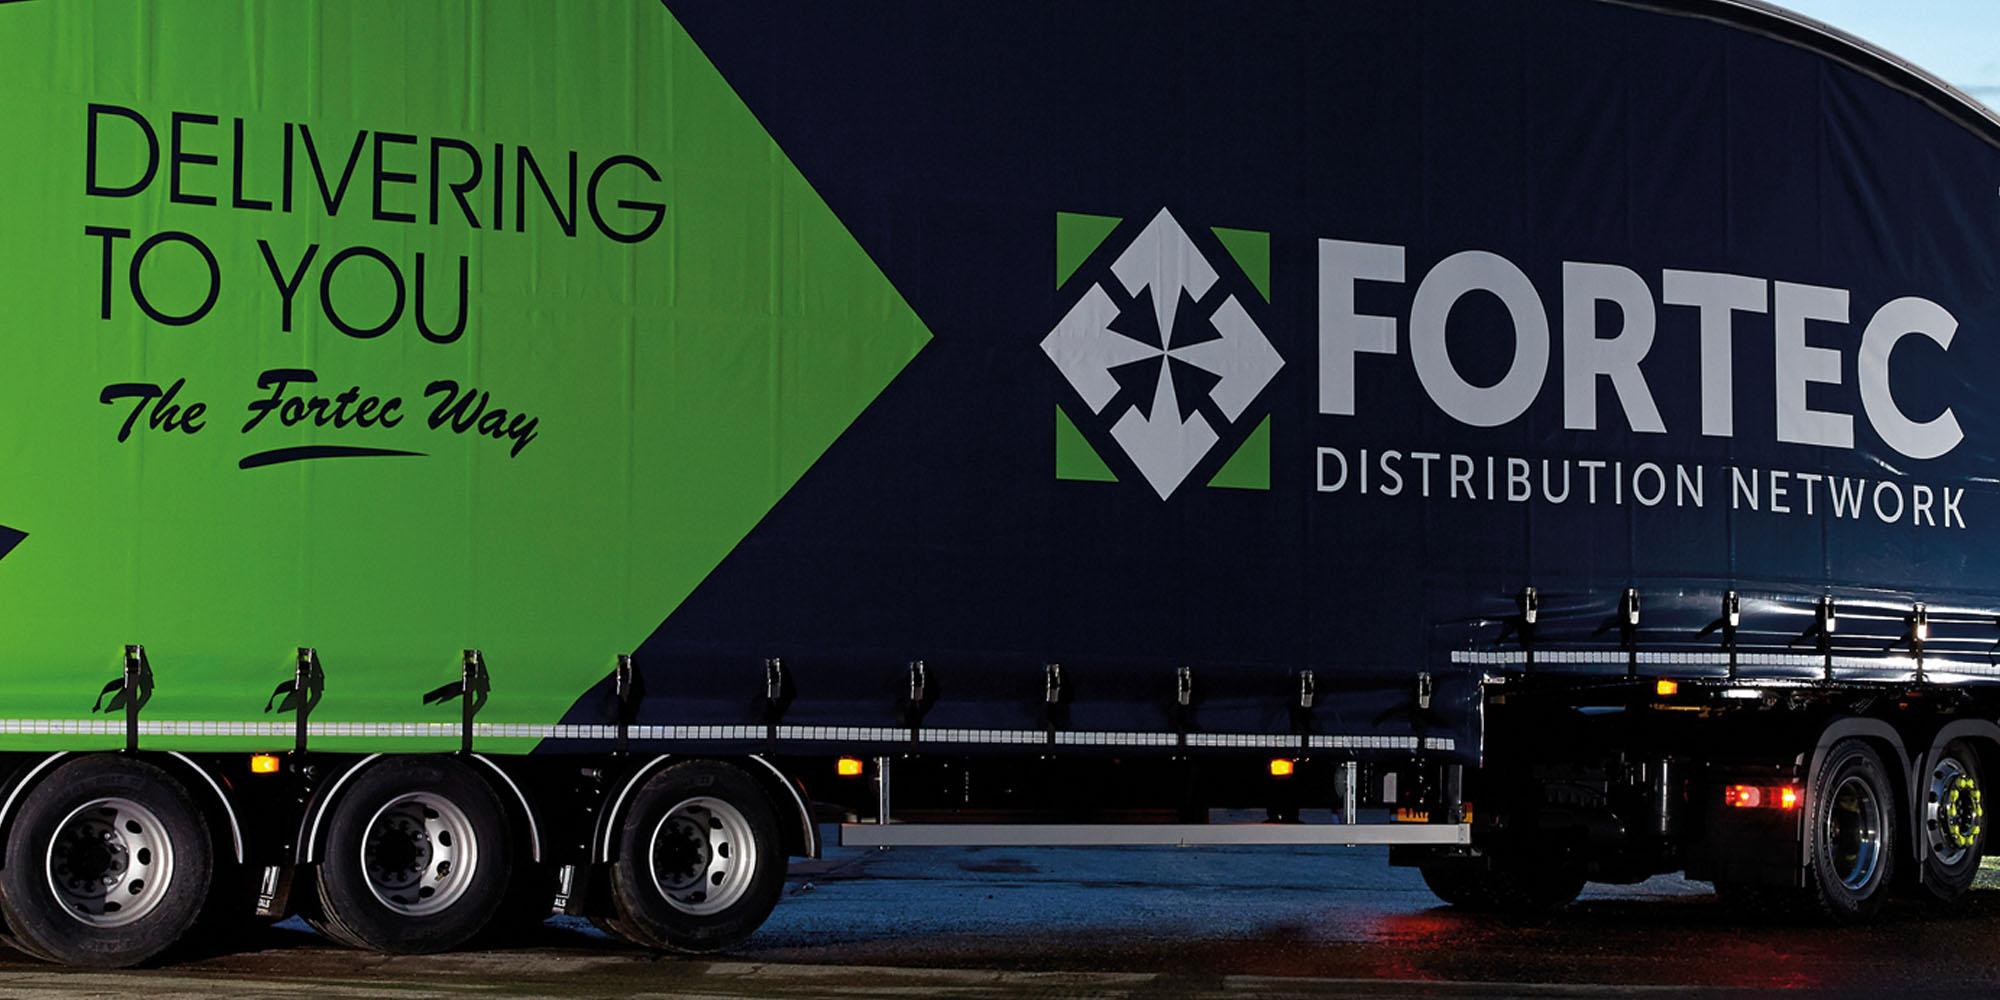 Fortec Distribution